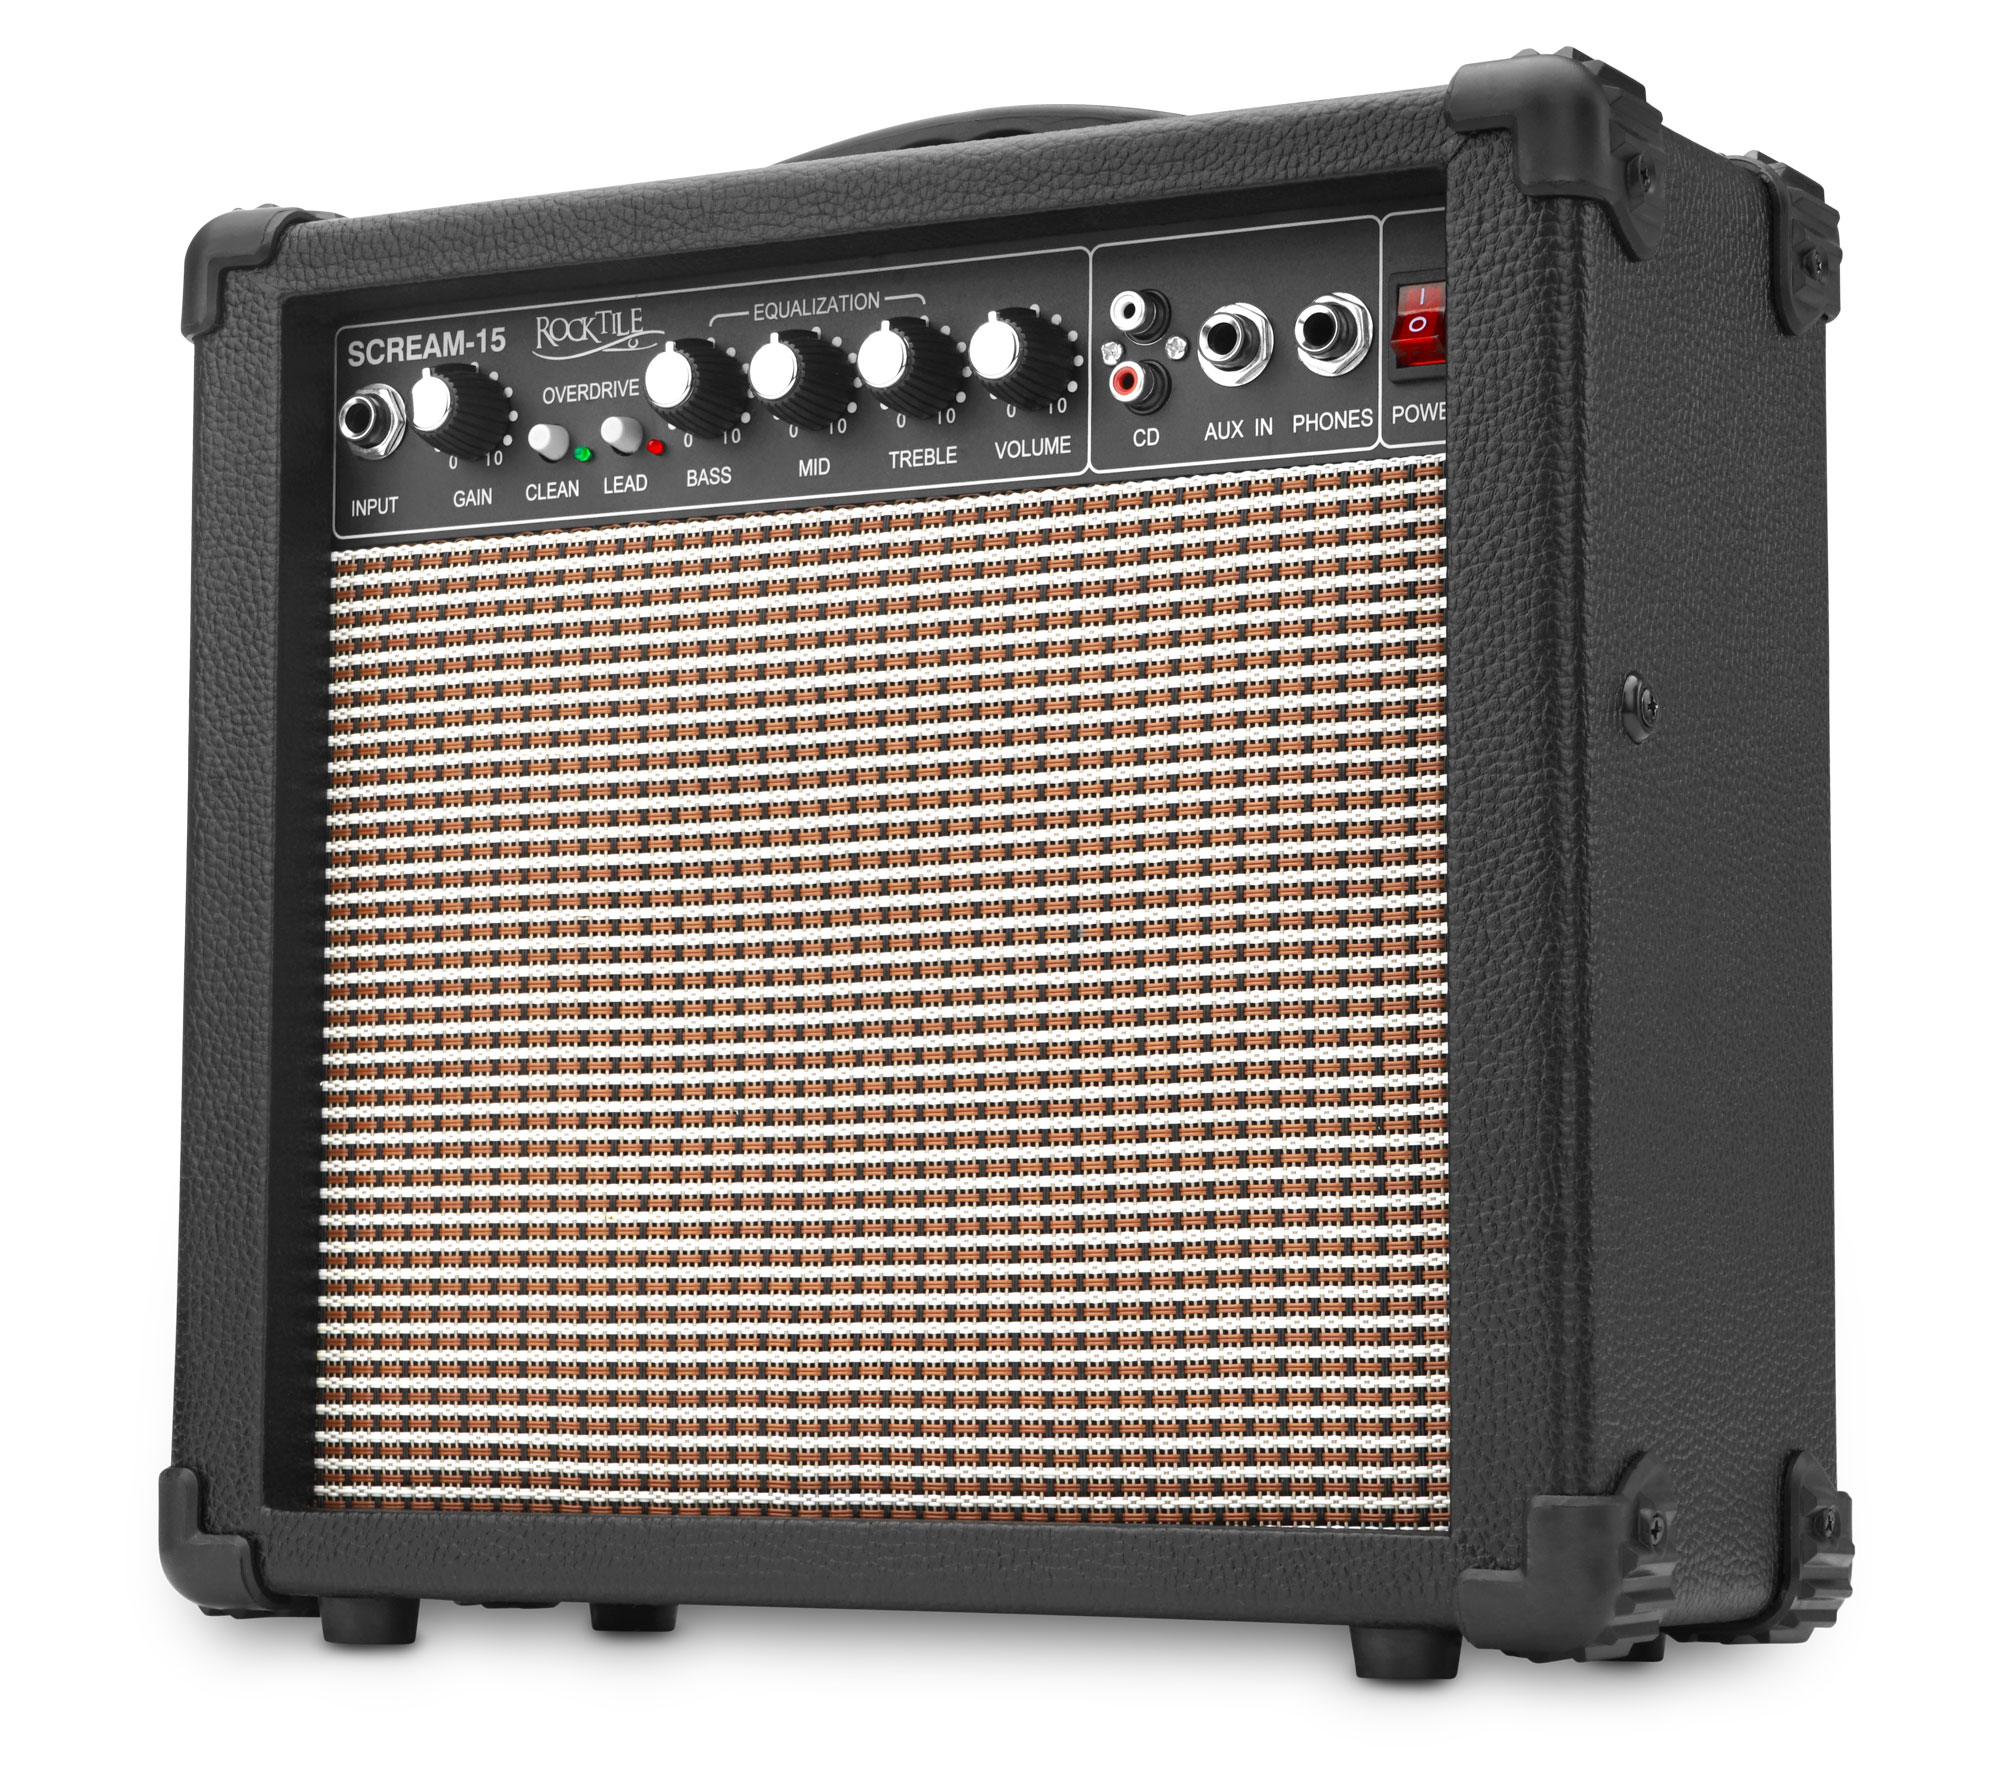 Mini Amps For Guitars : rocktile scream 15 mini guitar amplifier combo amp 15 watt amplifier 2 channel portable aux ~ Russianpoet.info Haus und Dekorationen